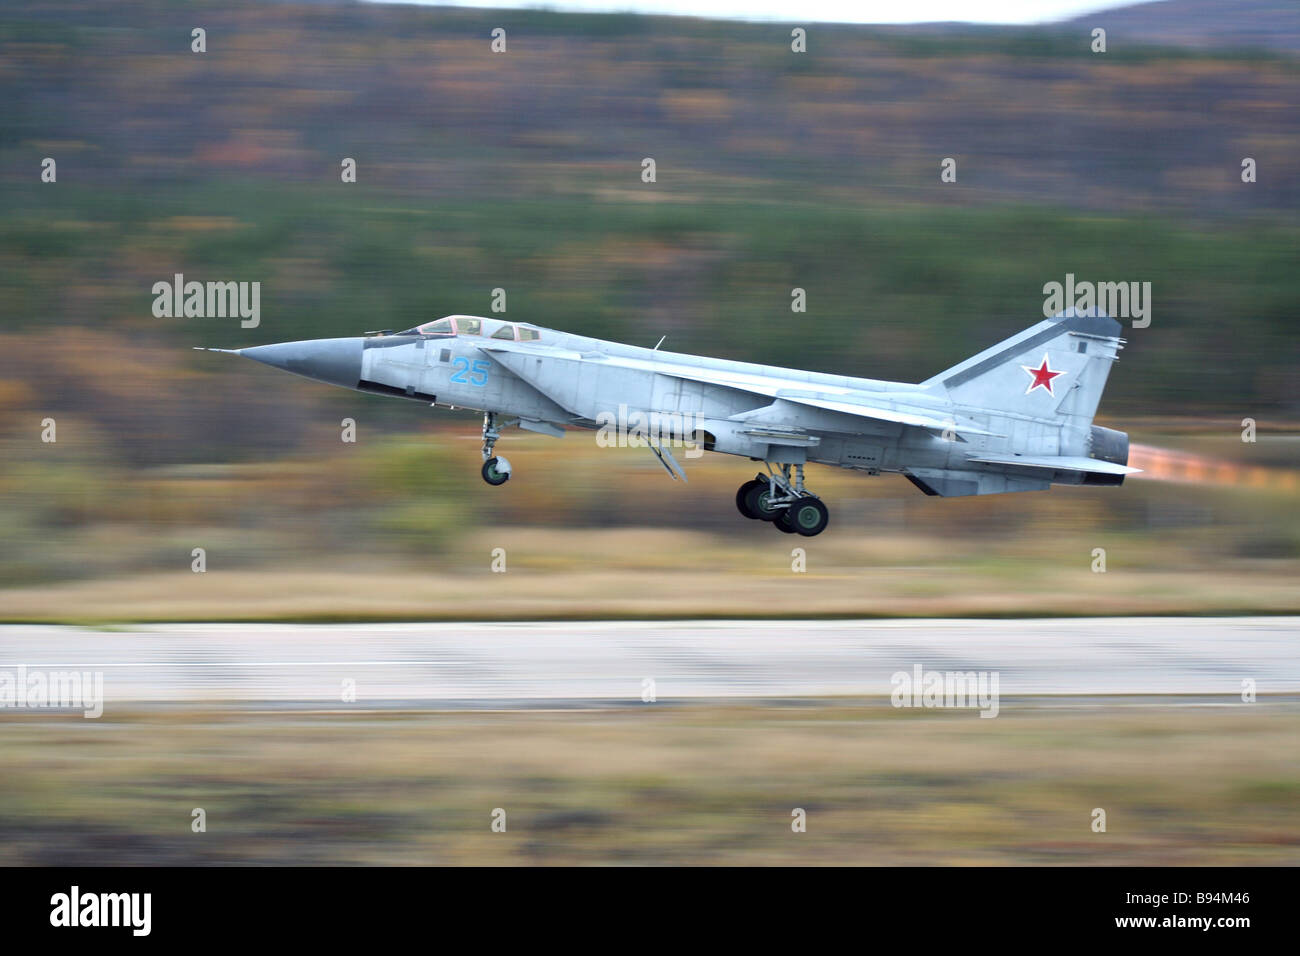 the-mig-31-interceptor-B94M46.jpg